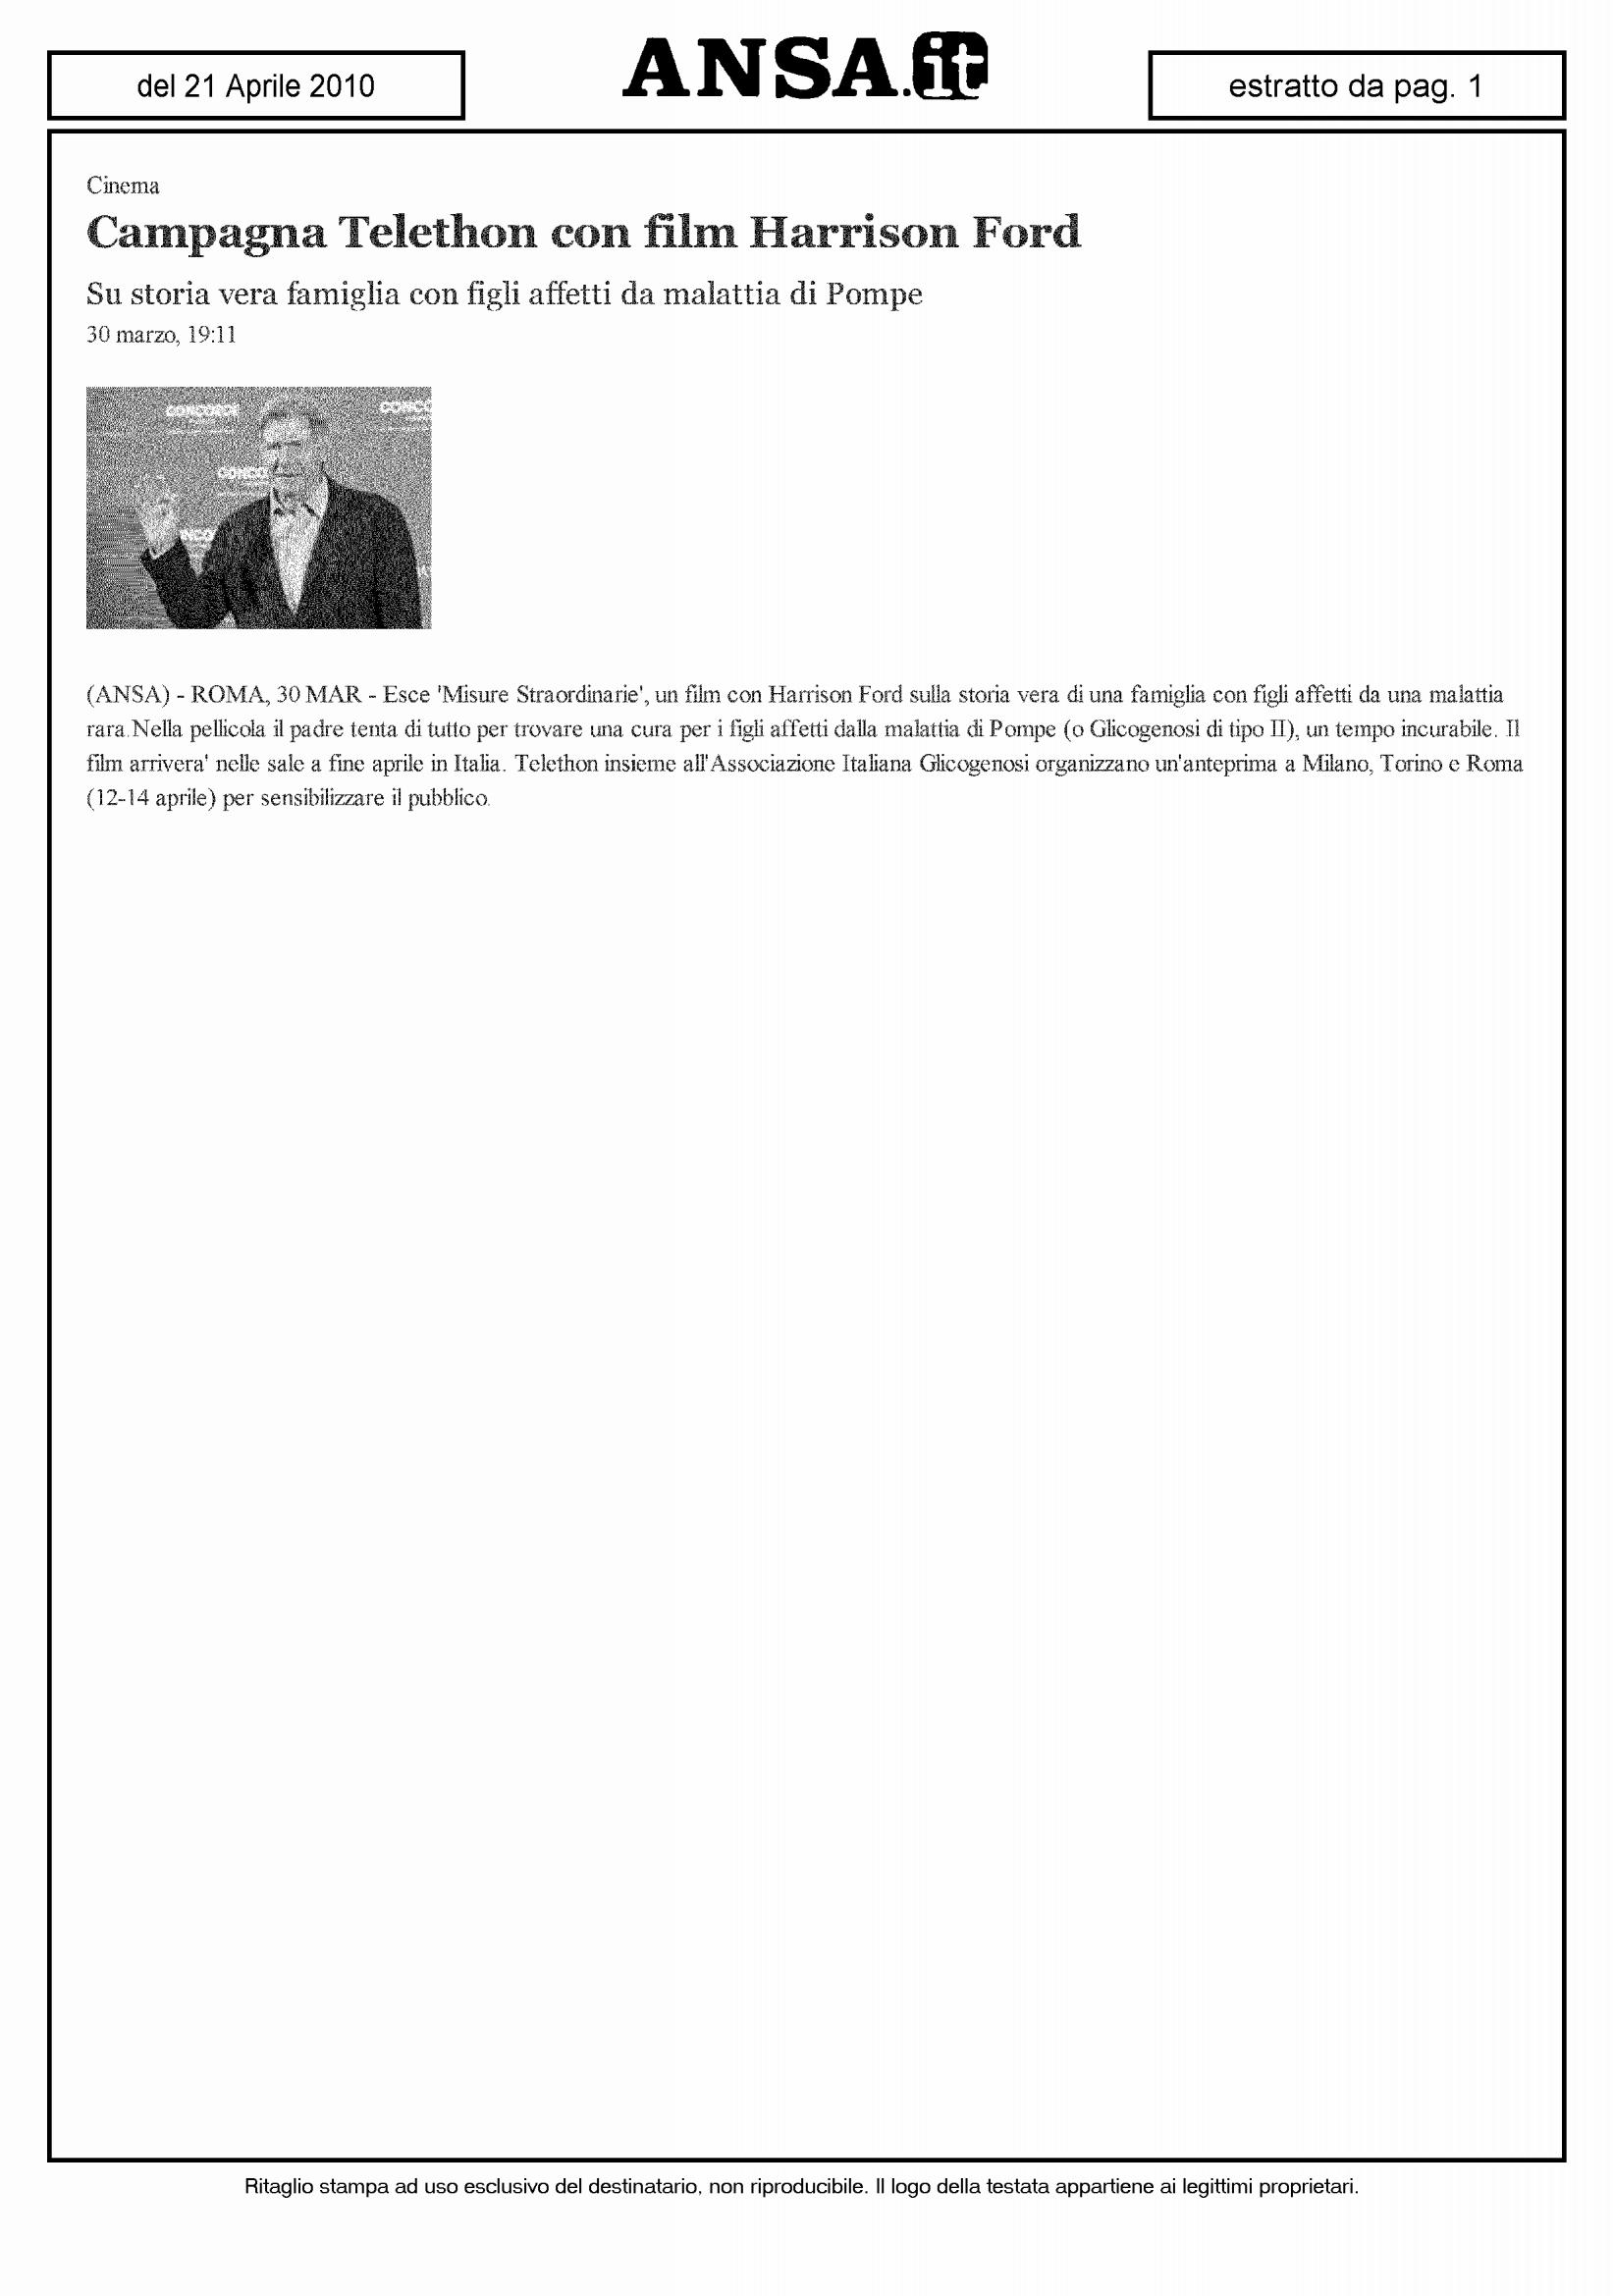 Stampa_20100422_misure straordinarie_Page_77